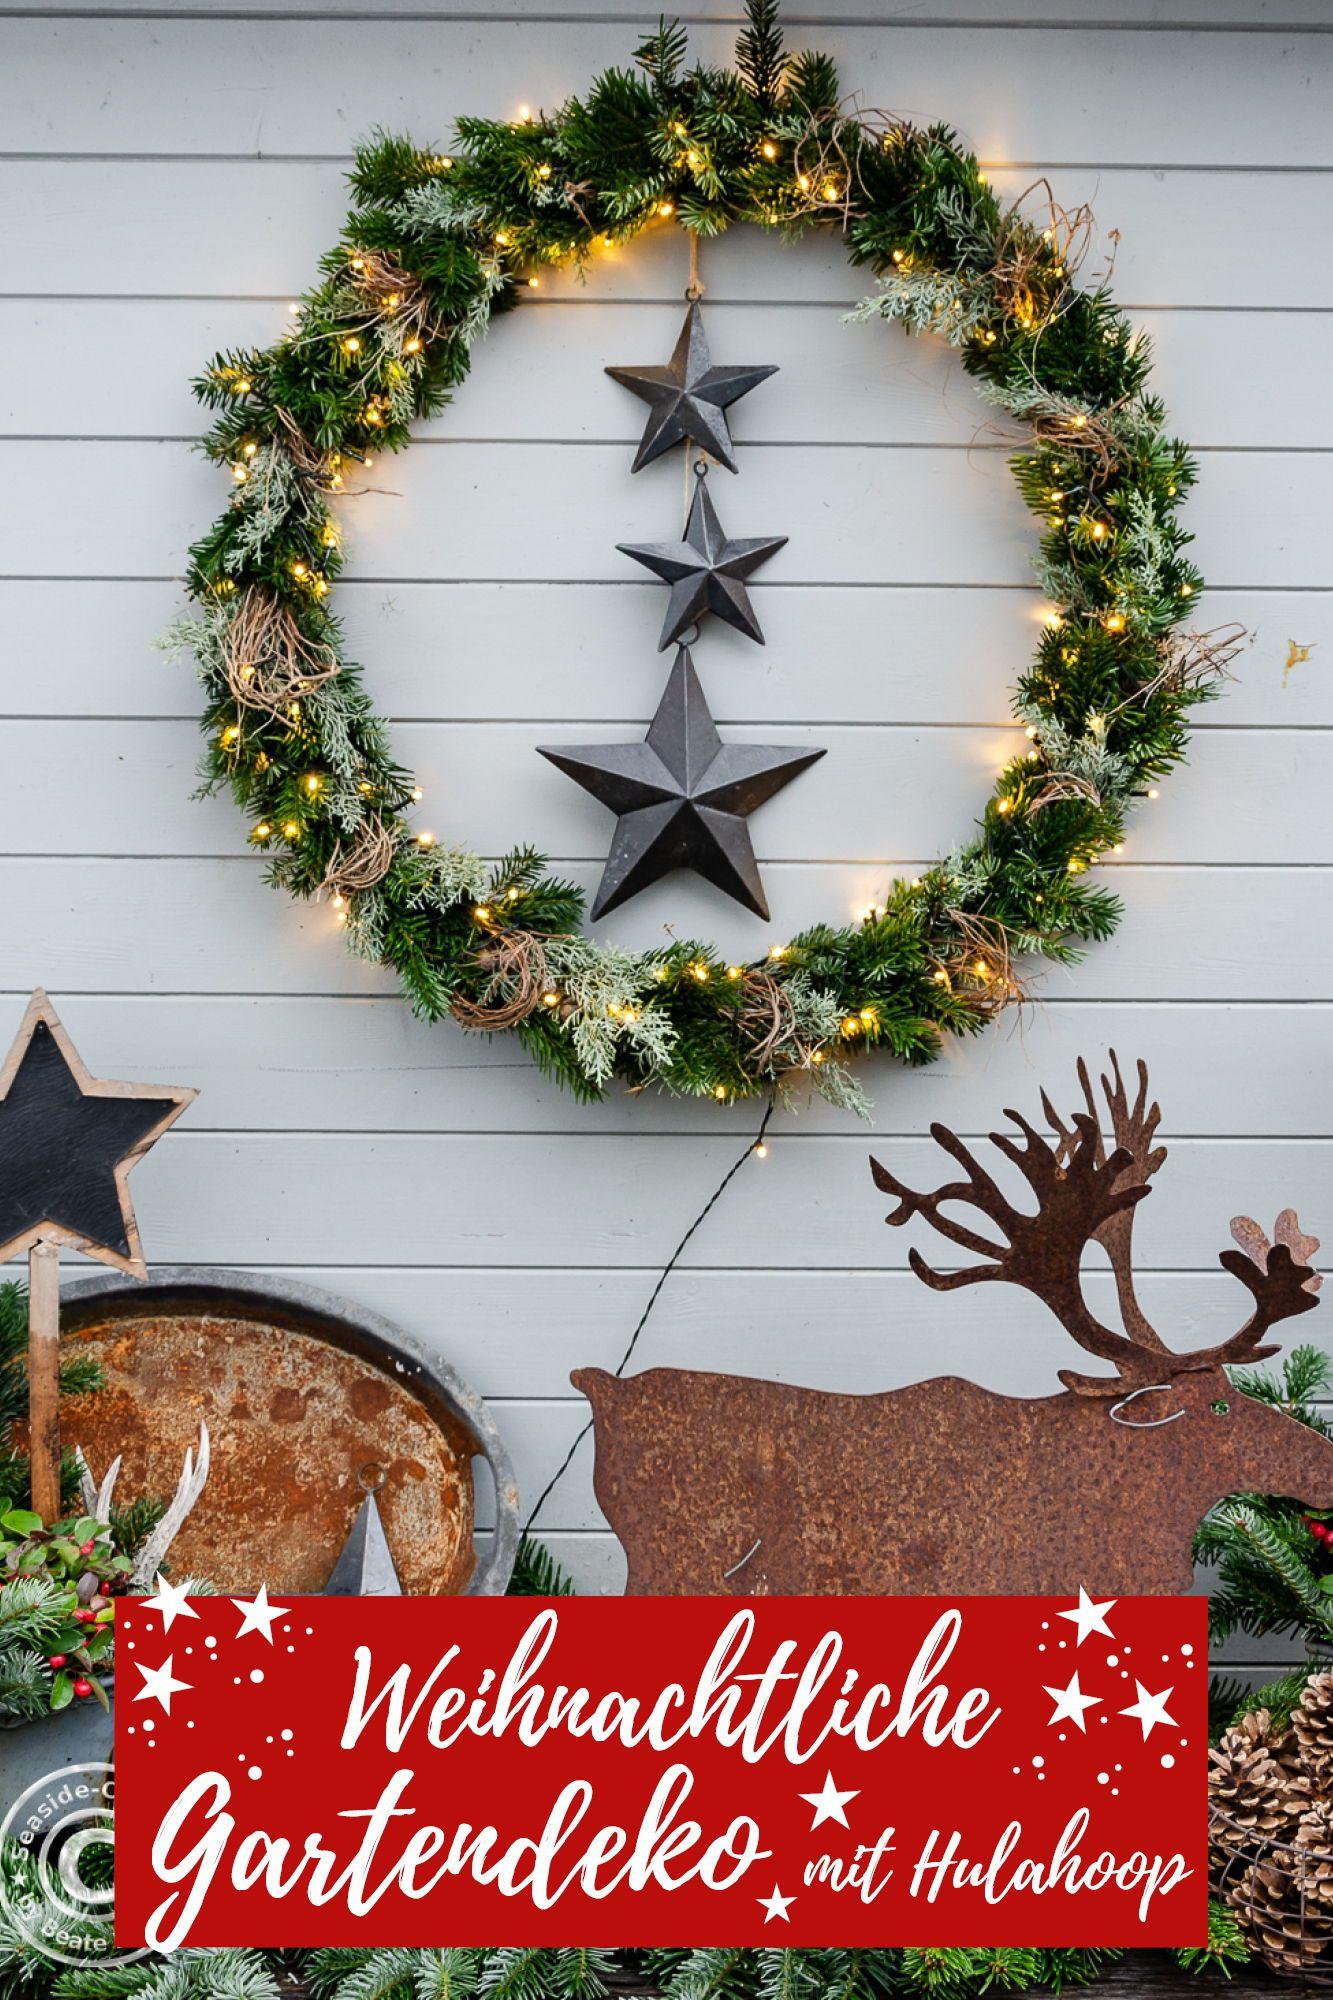 Blog Seaside Cottage Blog Deko Garten Weihnachten Weihnachten Deko Weihnachten